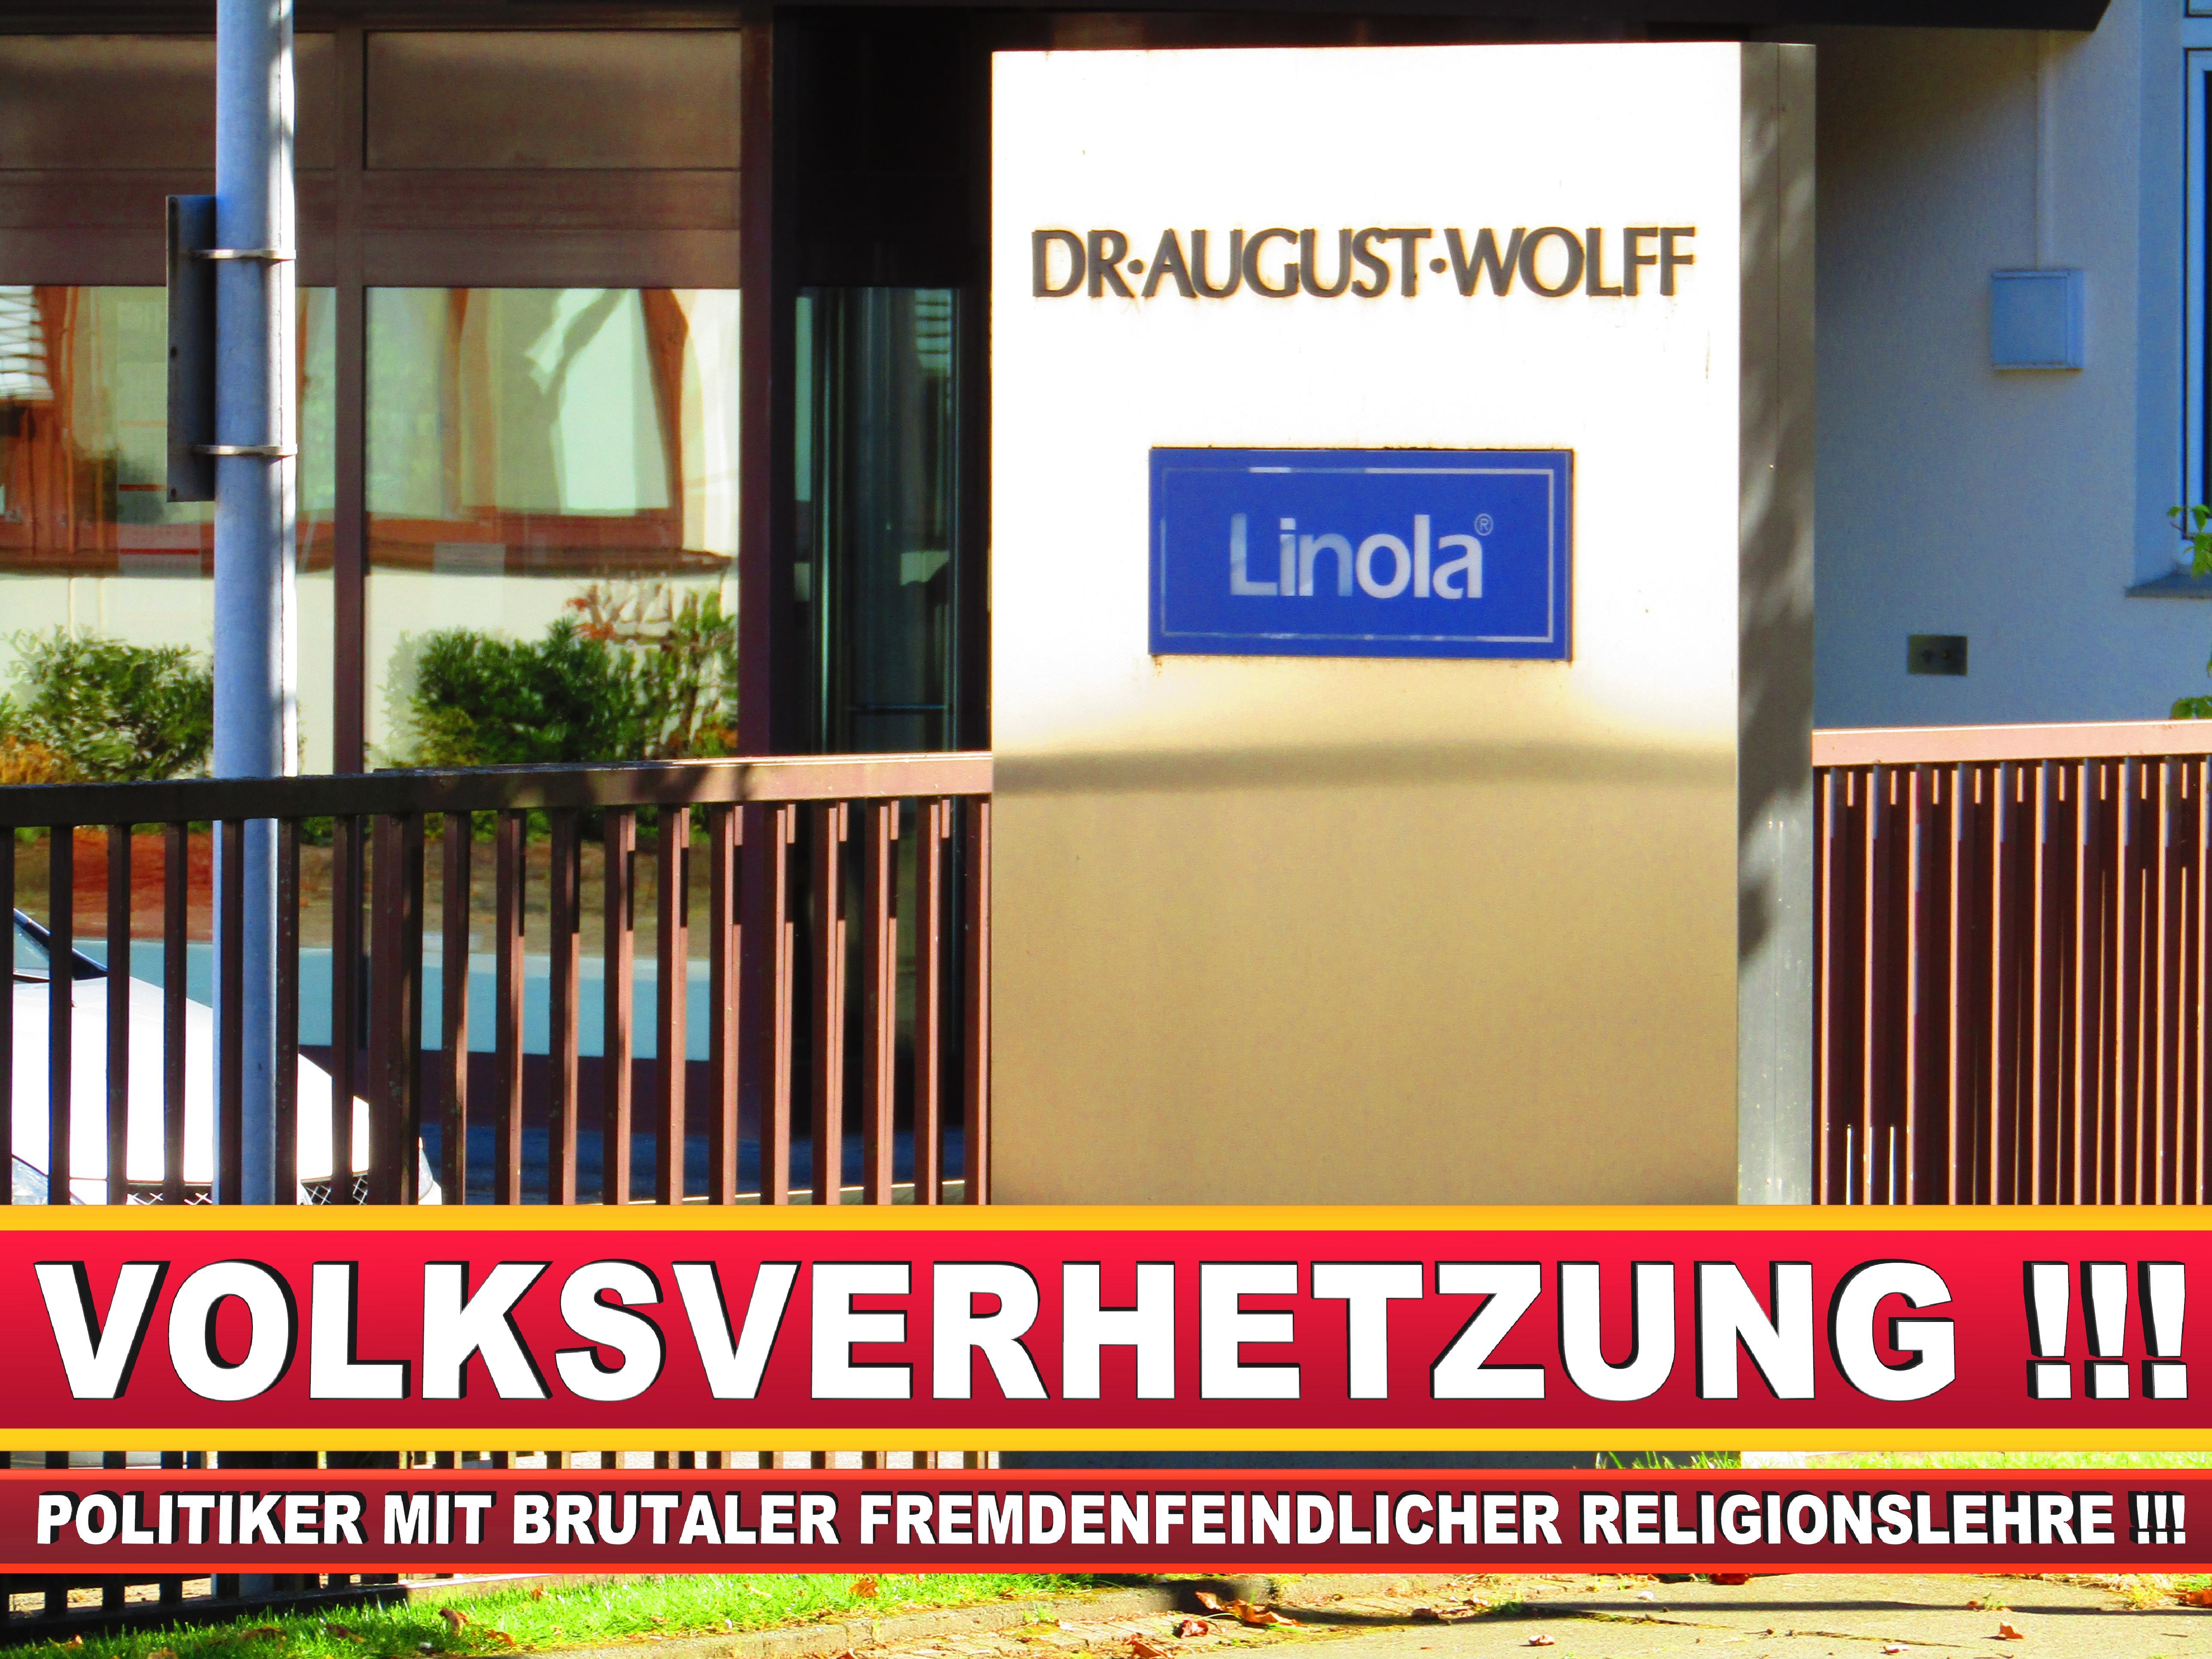 Dr August Wolff Linola CDU Bielefeld NRW OWL (1)